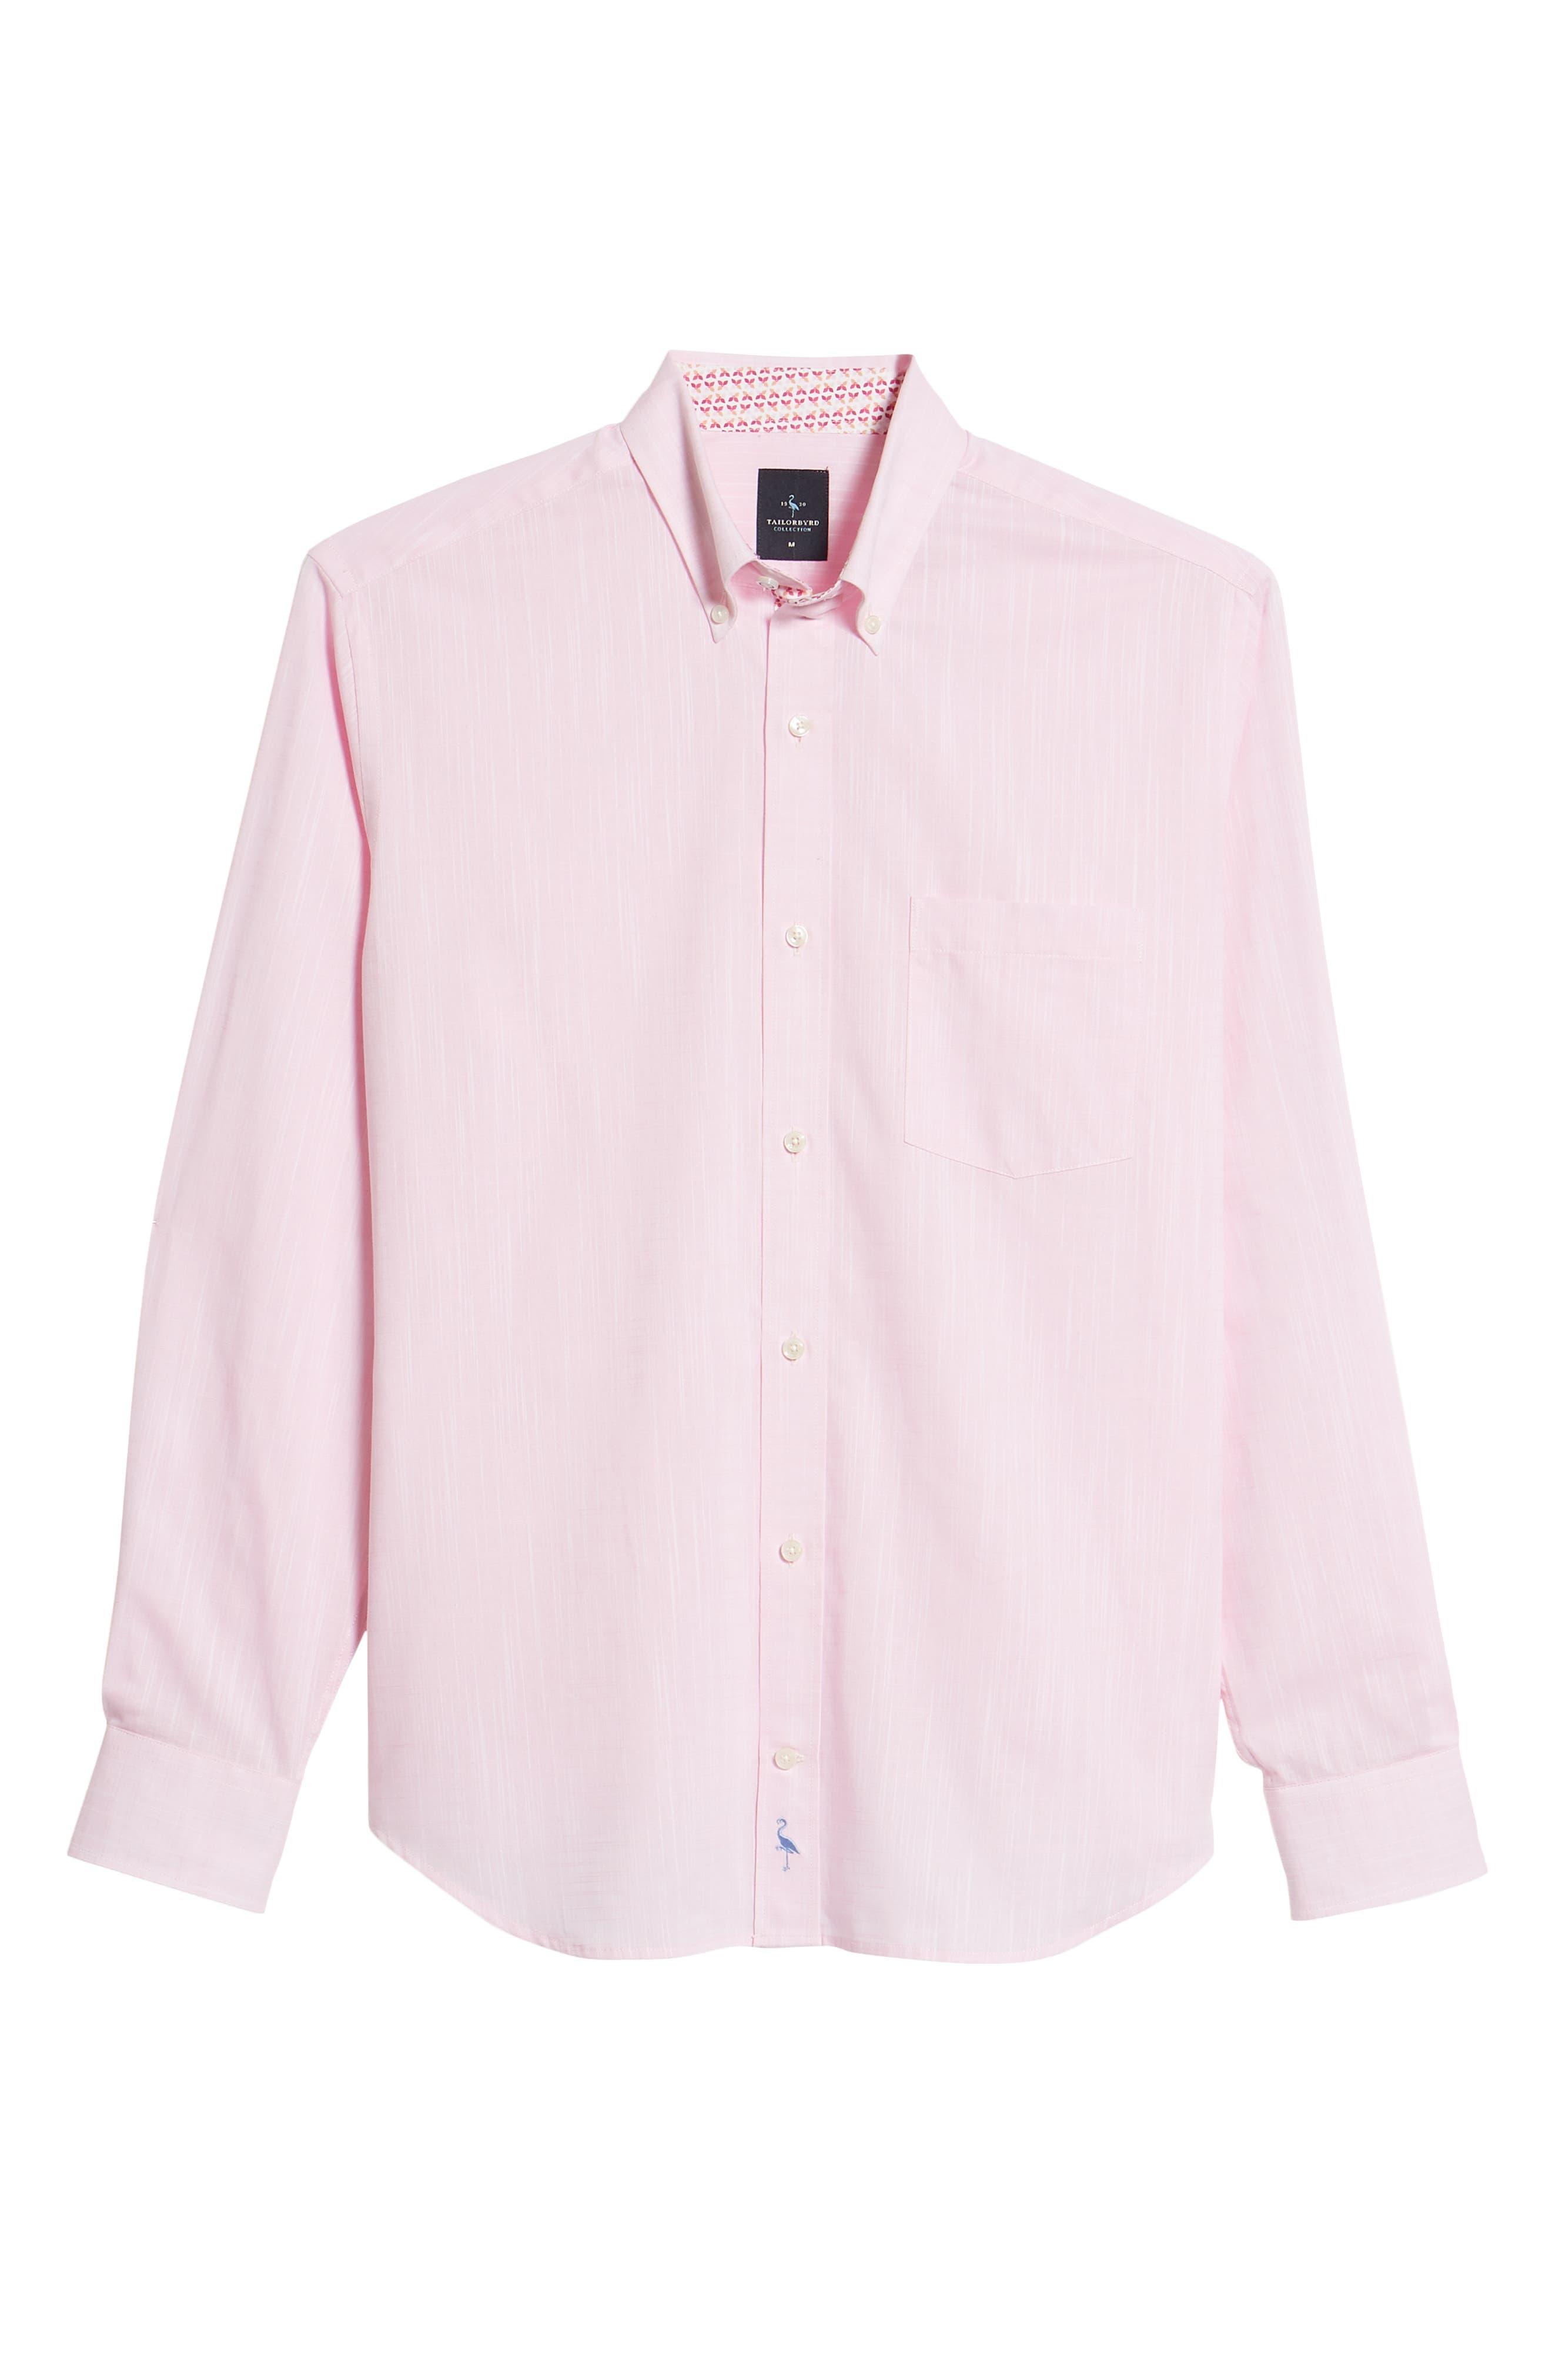 Kade Regular Fit Sport Shirt,                             Alternate thumbnail 6, color,                             Pink